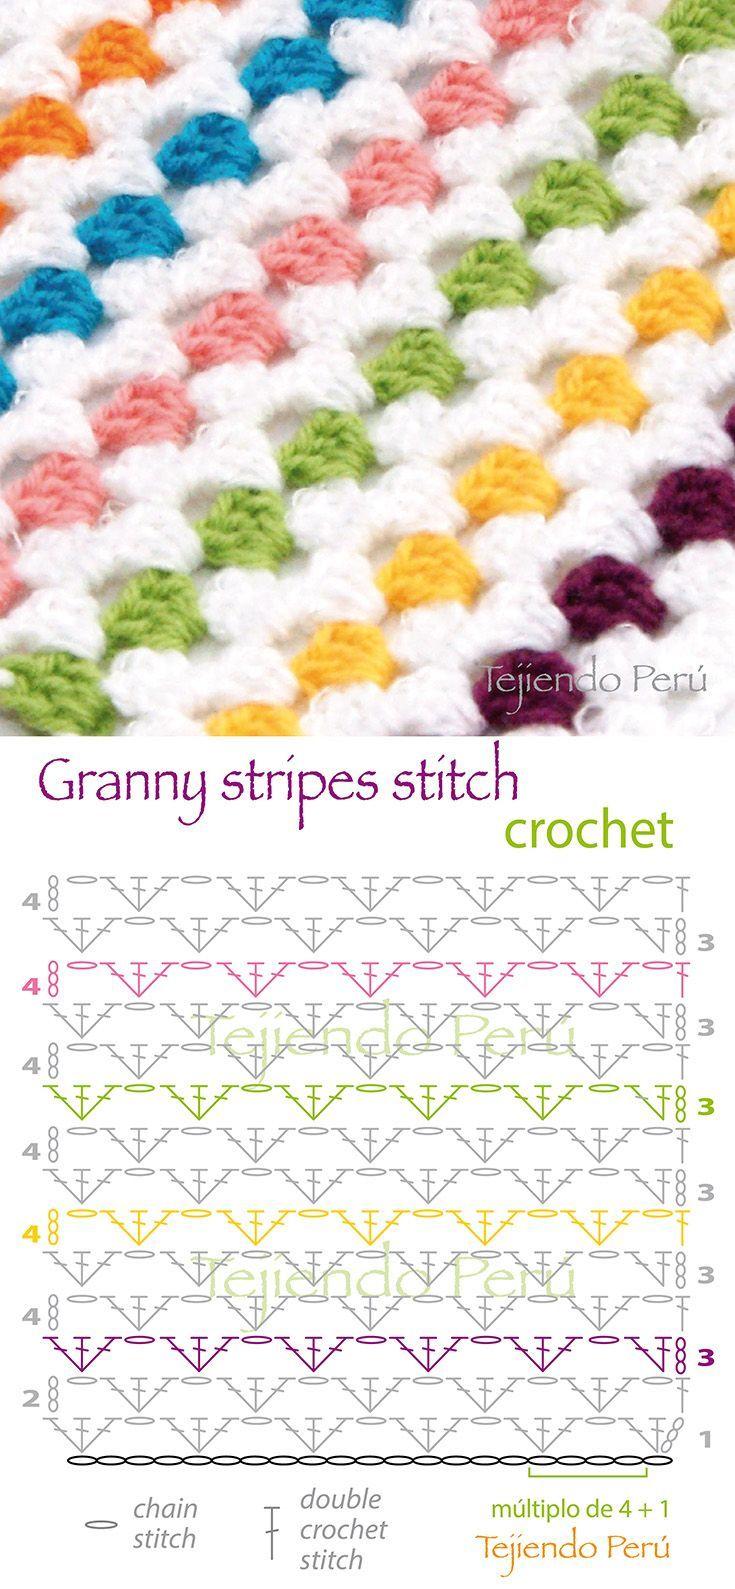 ergahandmade: Crochet Stitches + Diagrams                                                                                                                                                      More